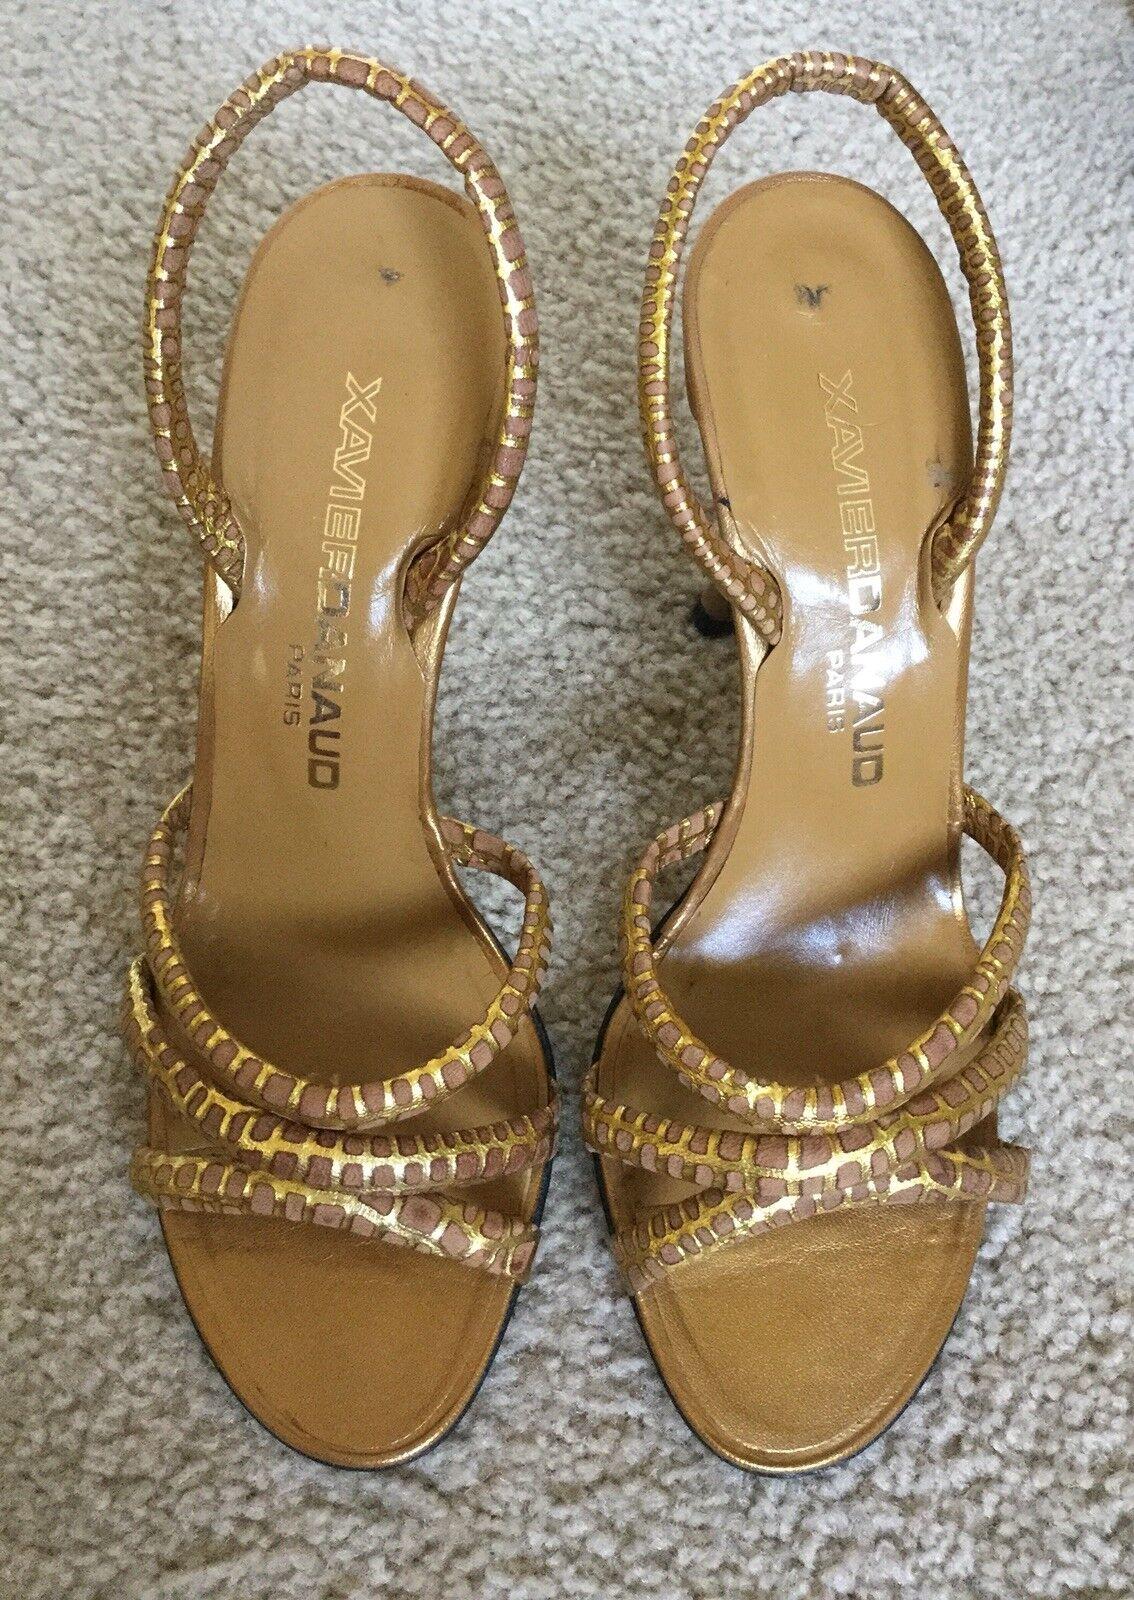 New Vintage Xavier Denaud Paris Nude Gold Leather Slingback Sandals France